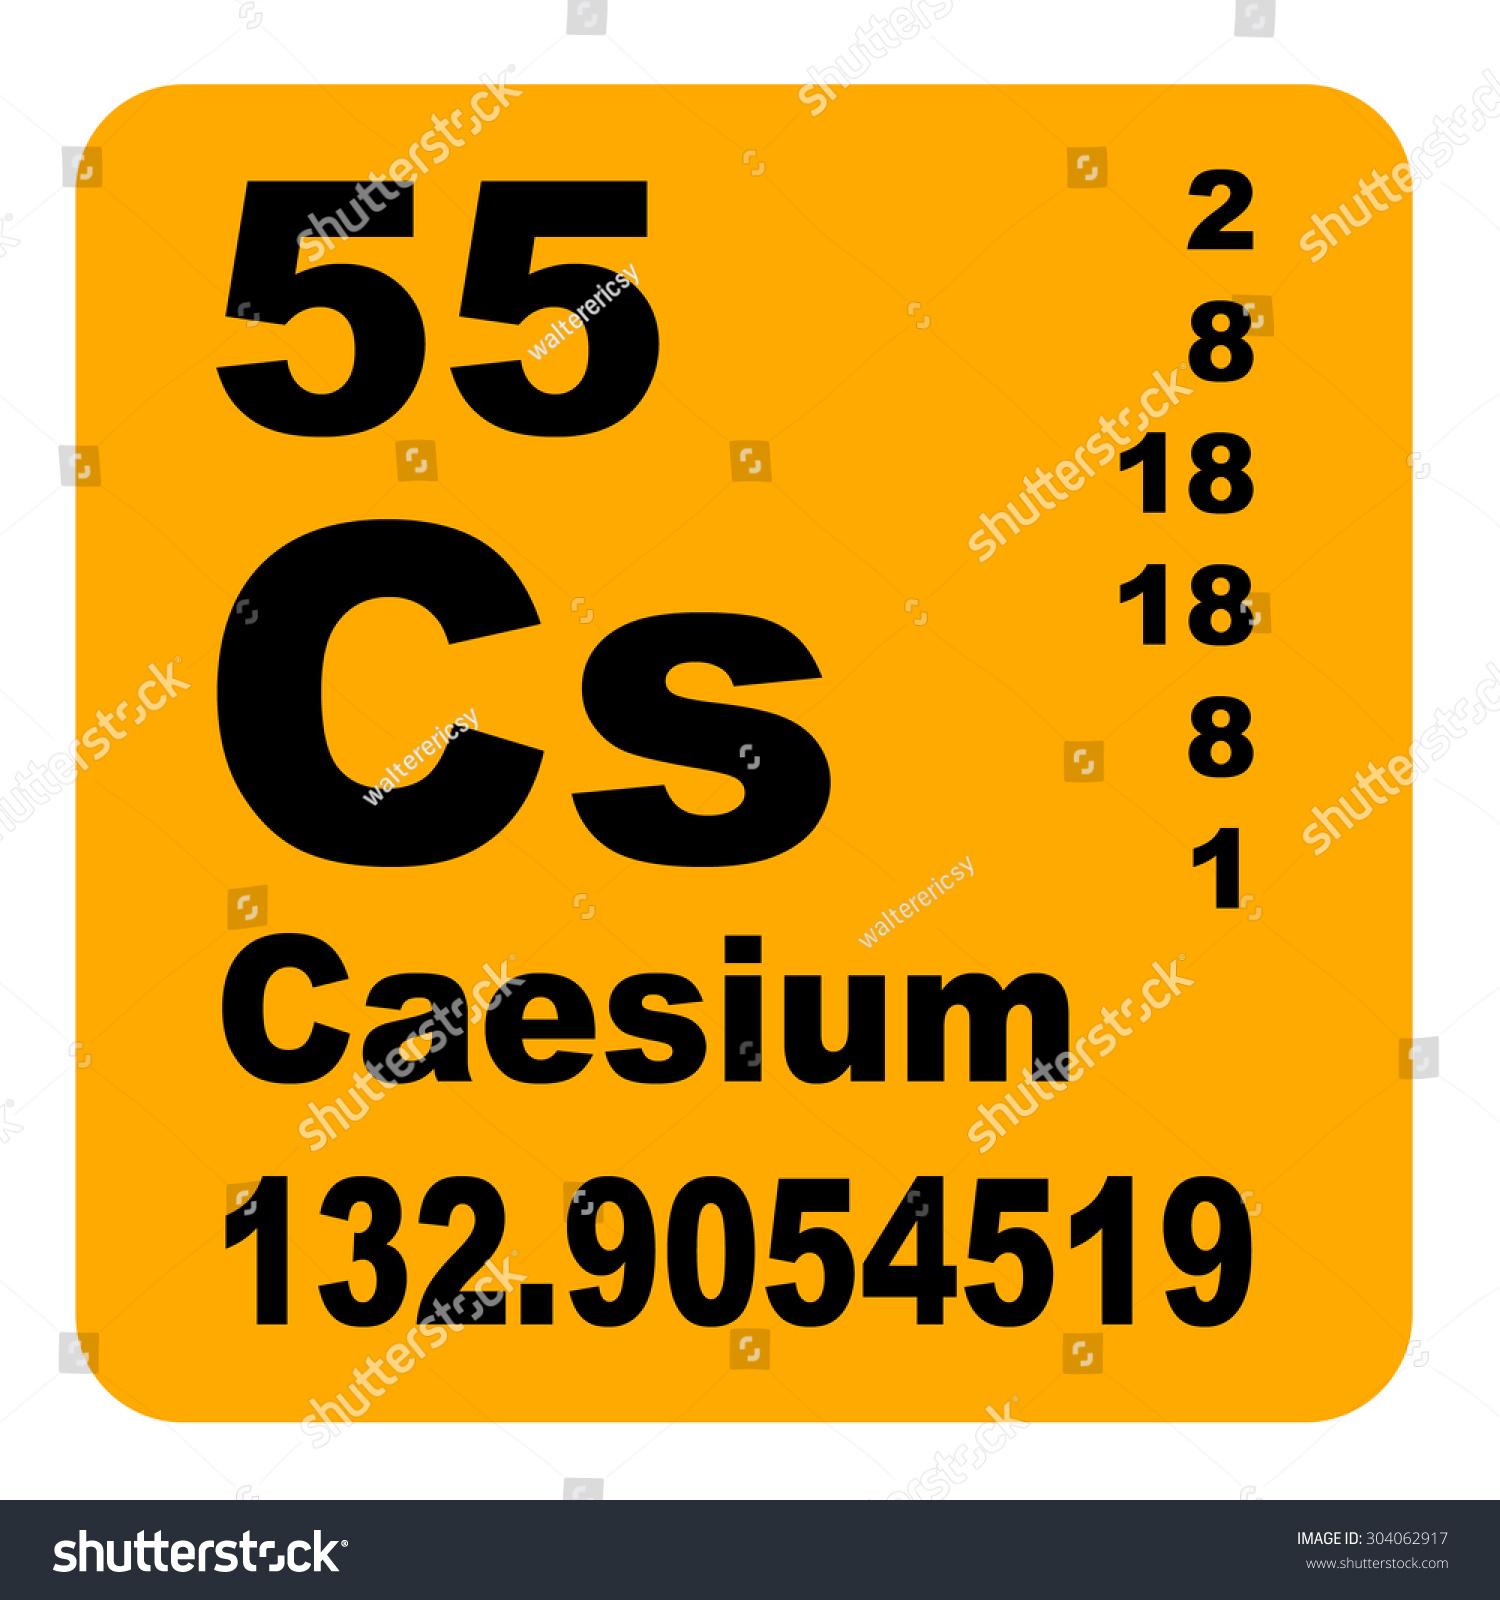 Caesium periodic table elements stock illustration 304062917 caesium periodic table of elements gamestrikefo Choice Image